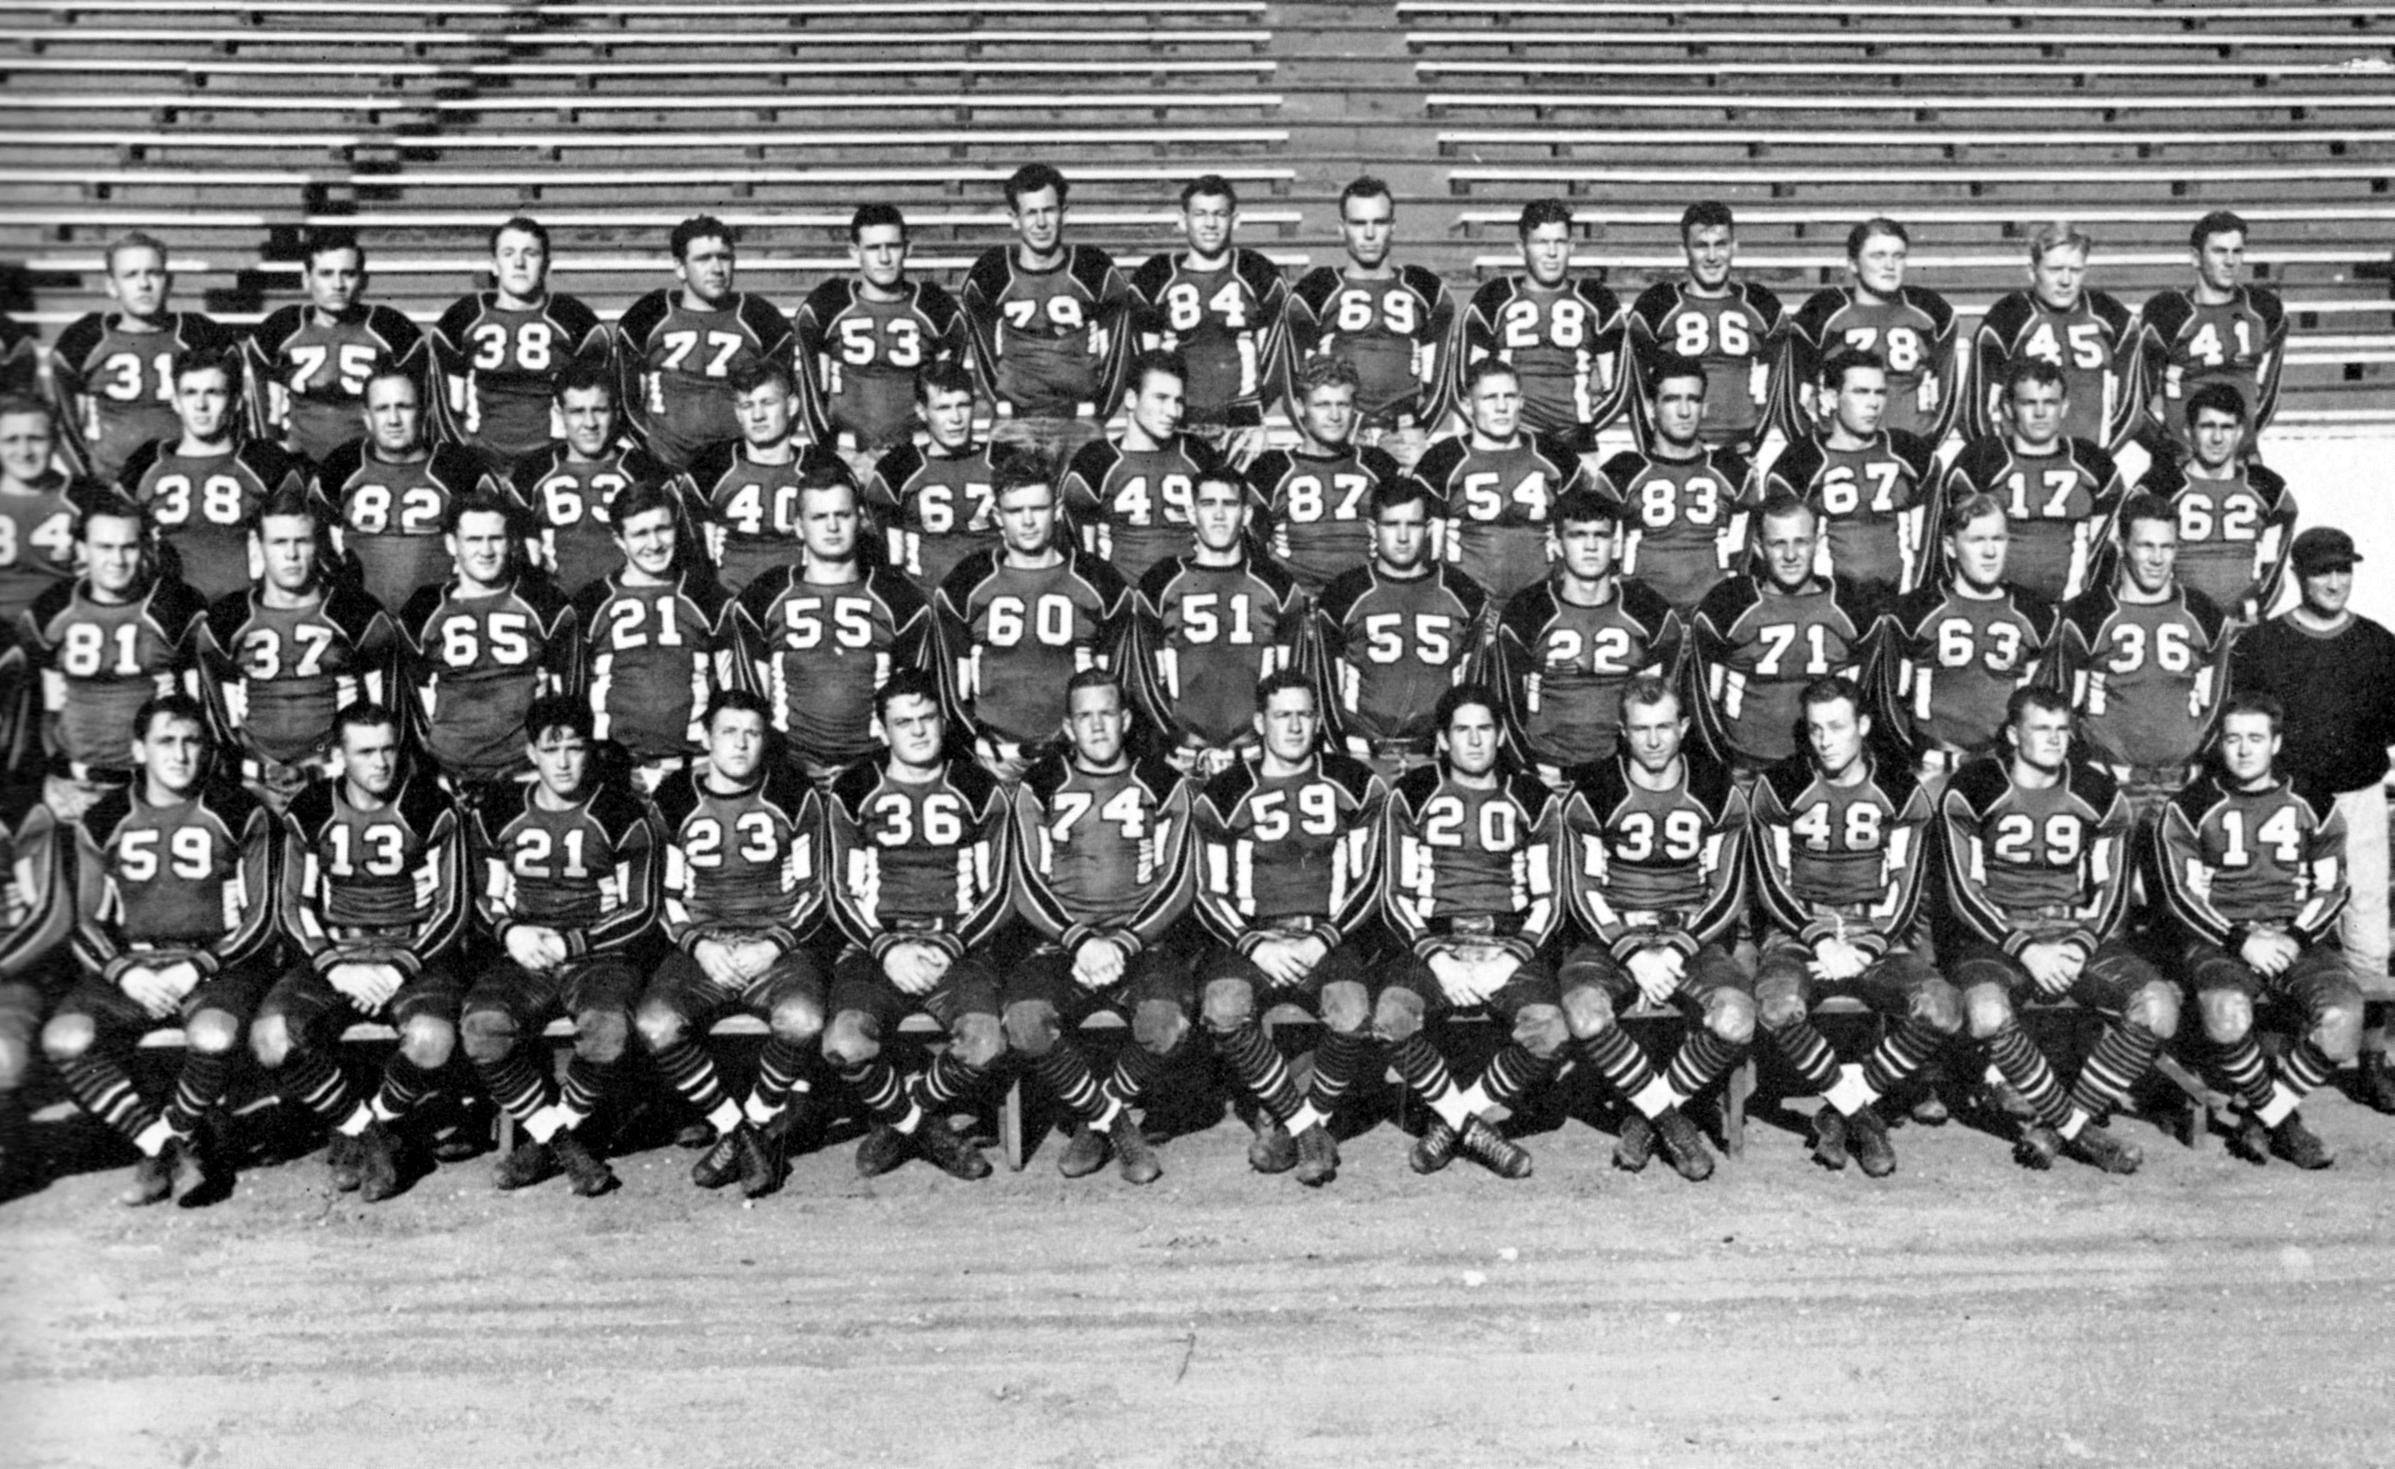 1939 Texas Tech football team photo